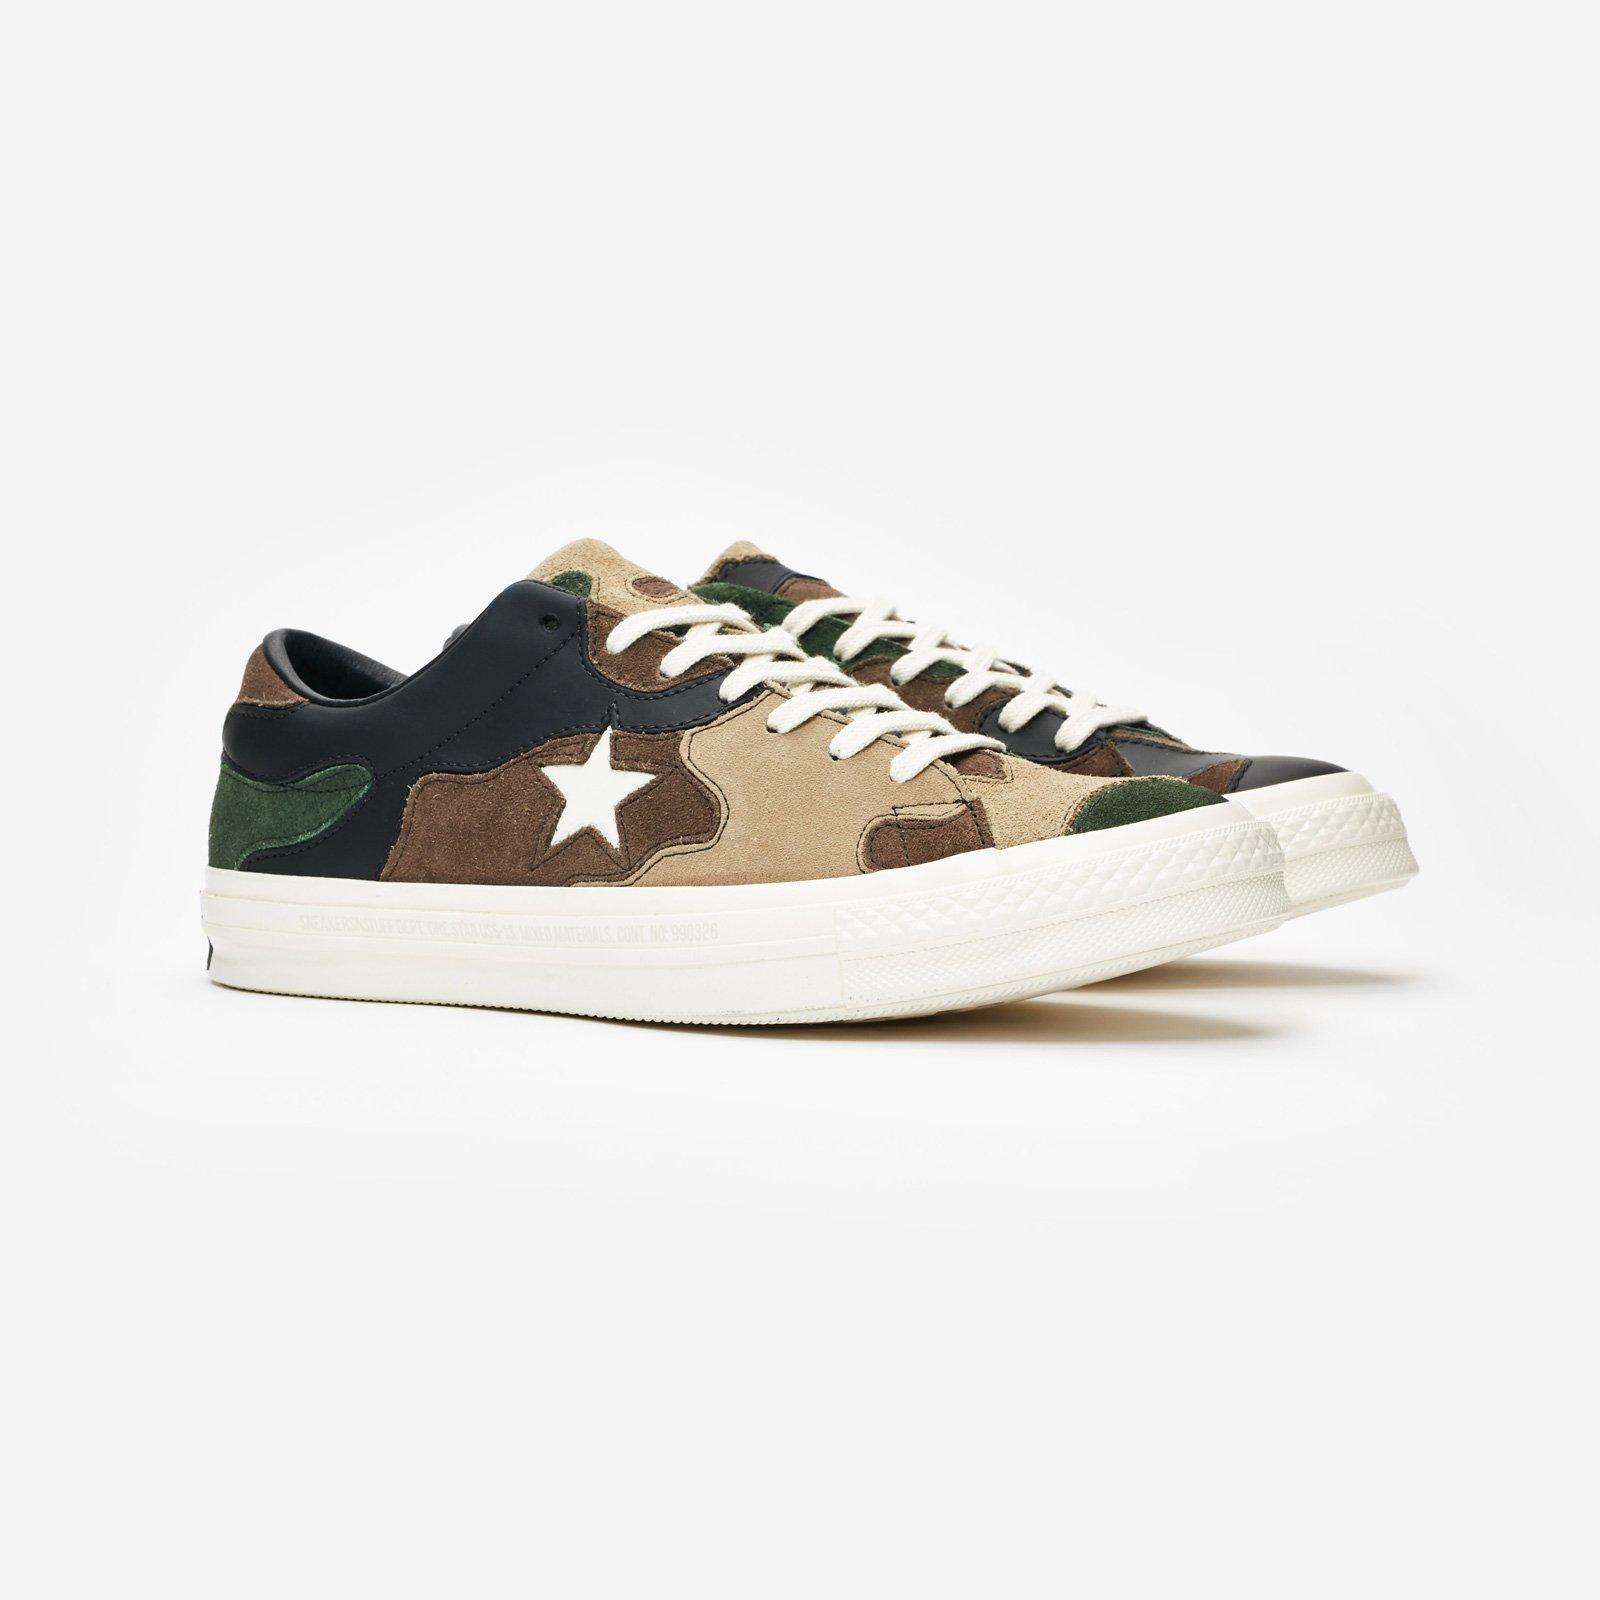 03d9a0b898fa Converse One Star x Sneakersnstuff - 161406c - Sneakersnstuff I Sneakers    Streetwear online seit 1999